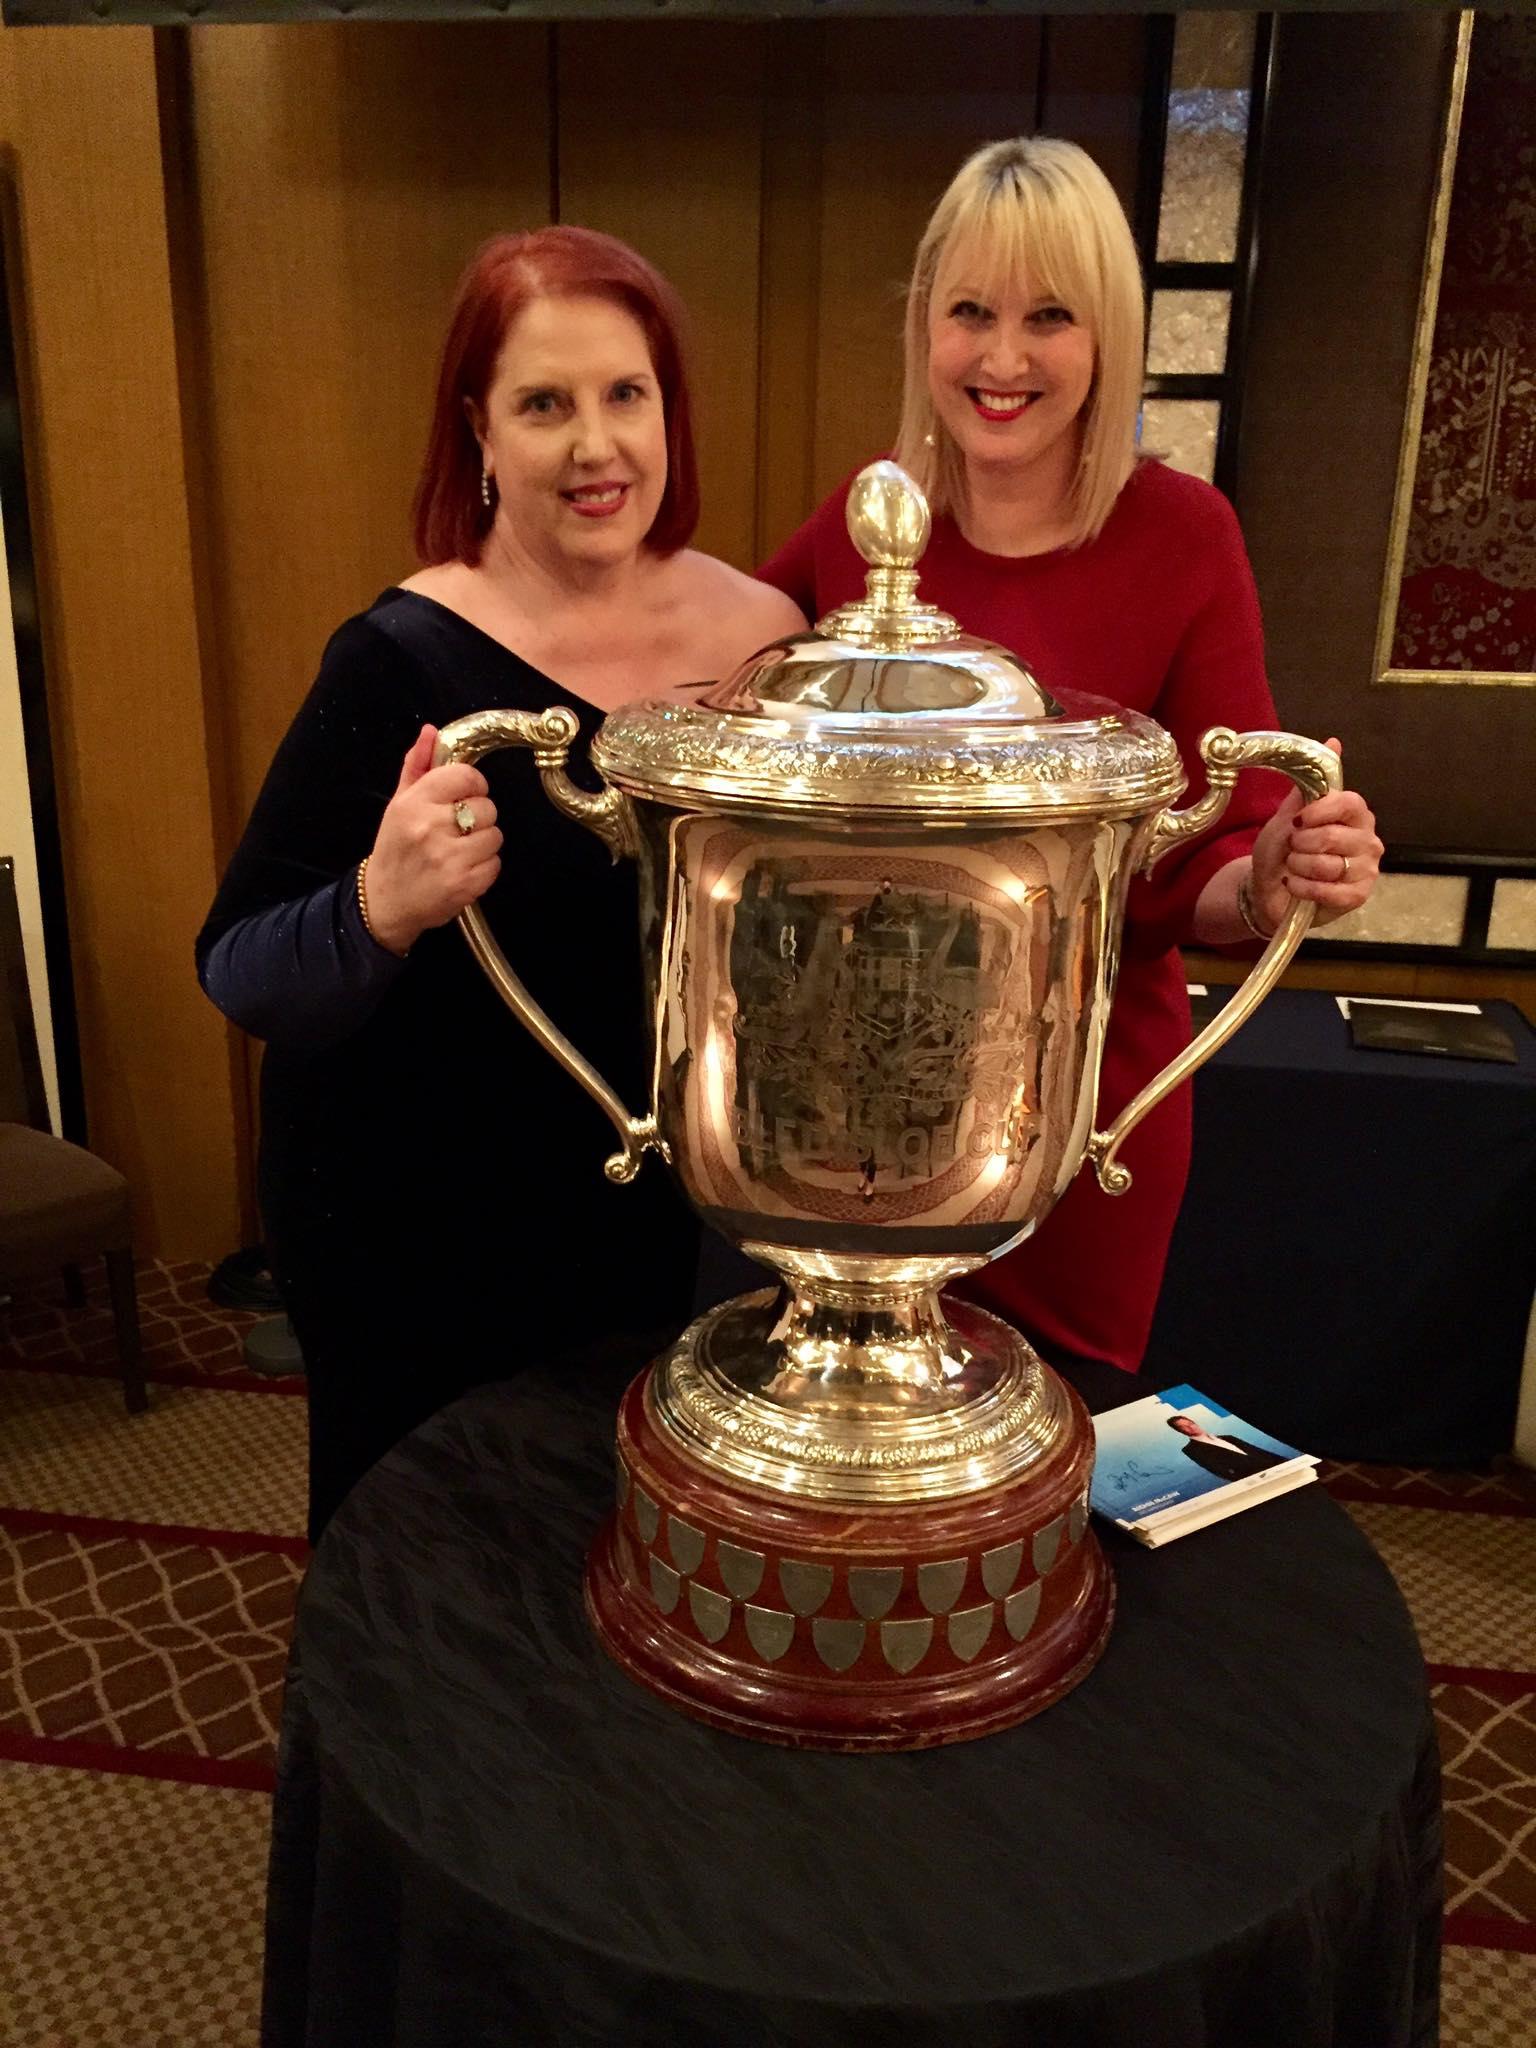 The Bledisloe Cup